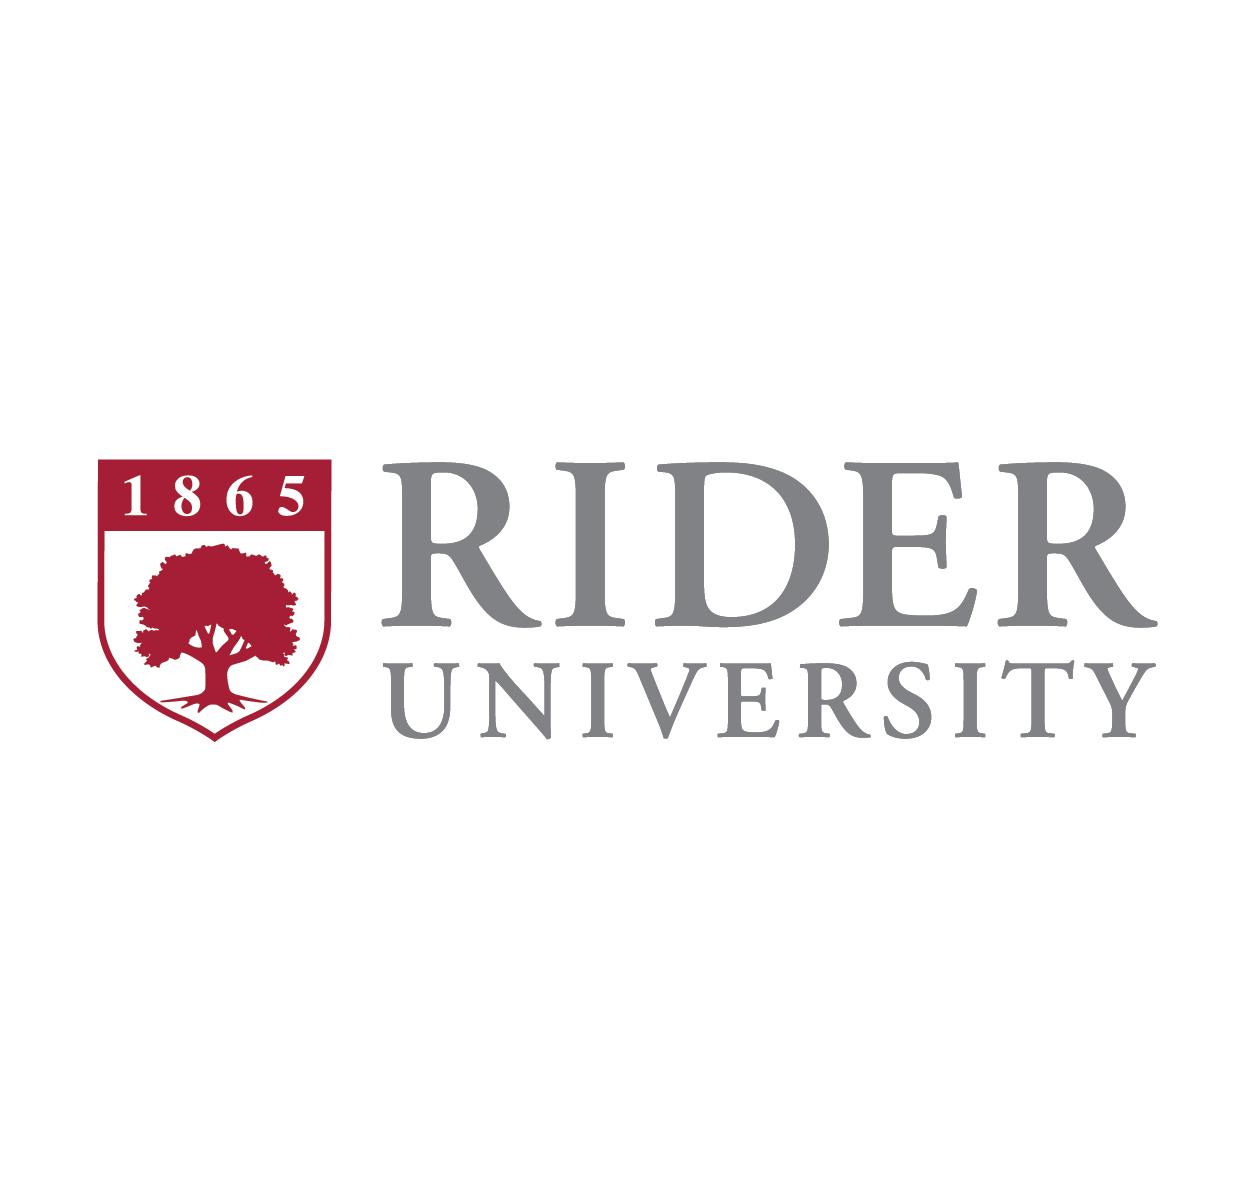 Project Image for Identity, Rider University Logo